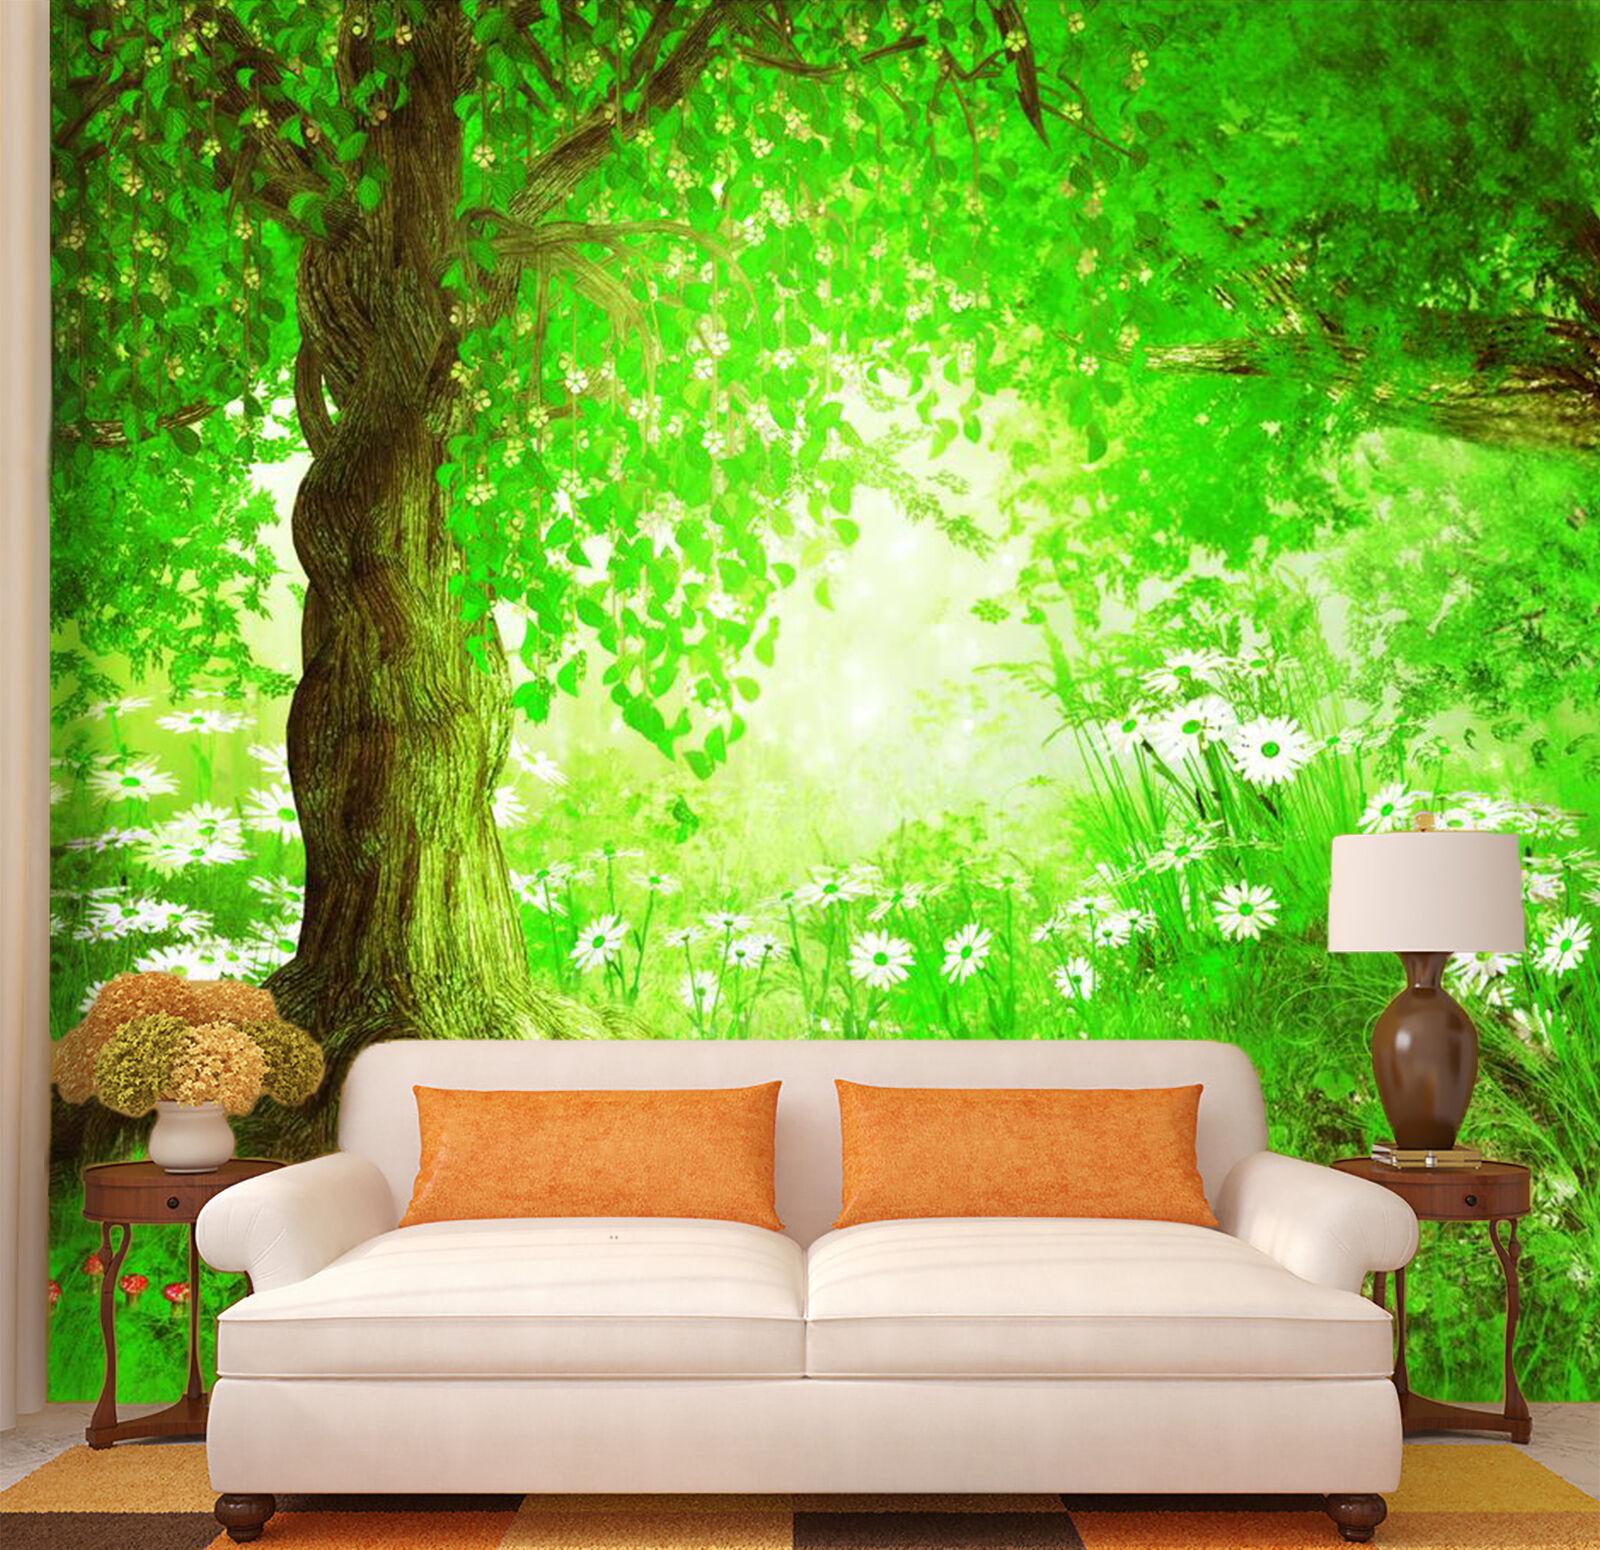 3D Schöne Bäume 195 Fototapeten Wandbild Fototapete Bild Tapete Familie Kinder